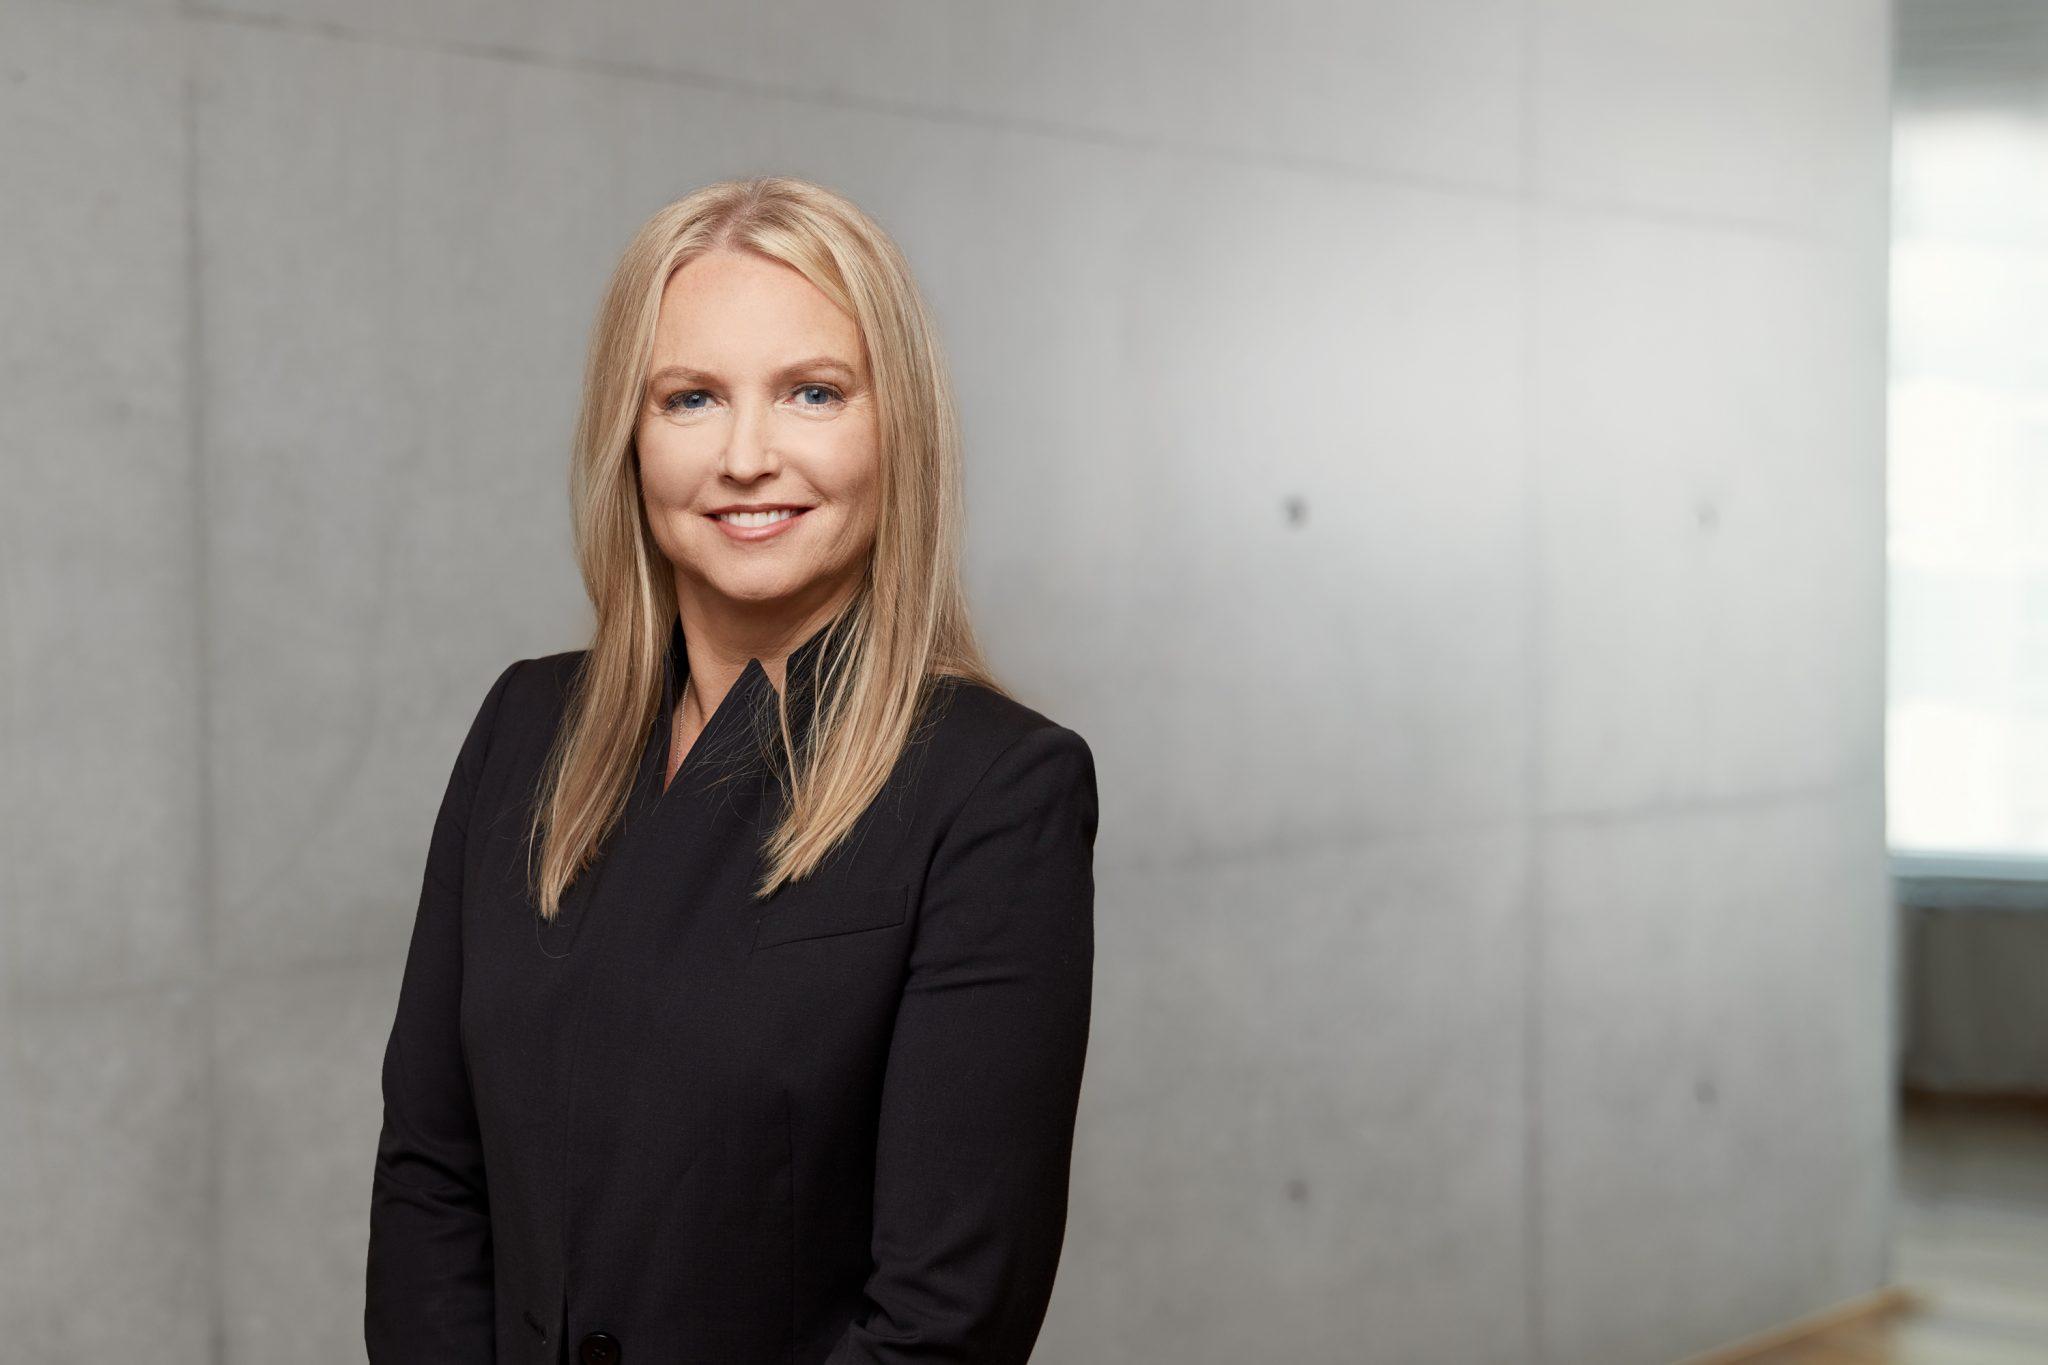 Lilja Jónasdóttir